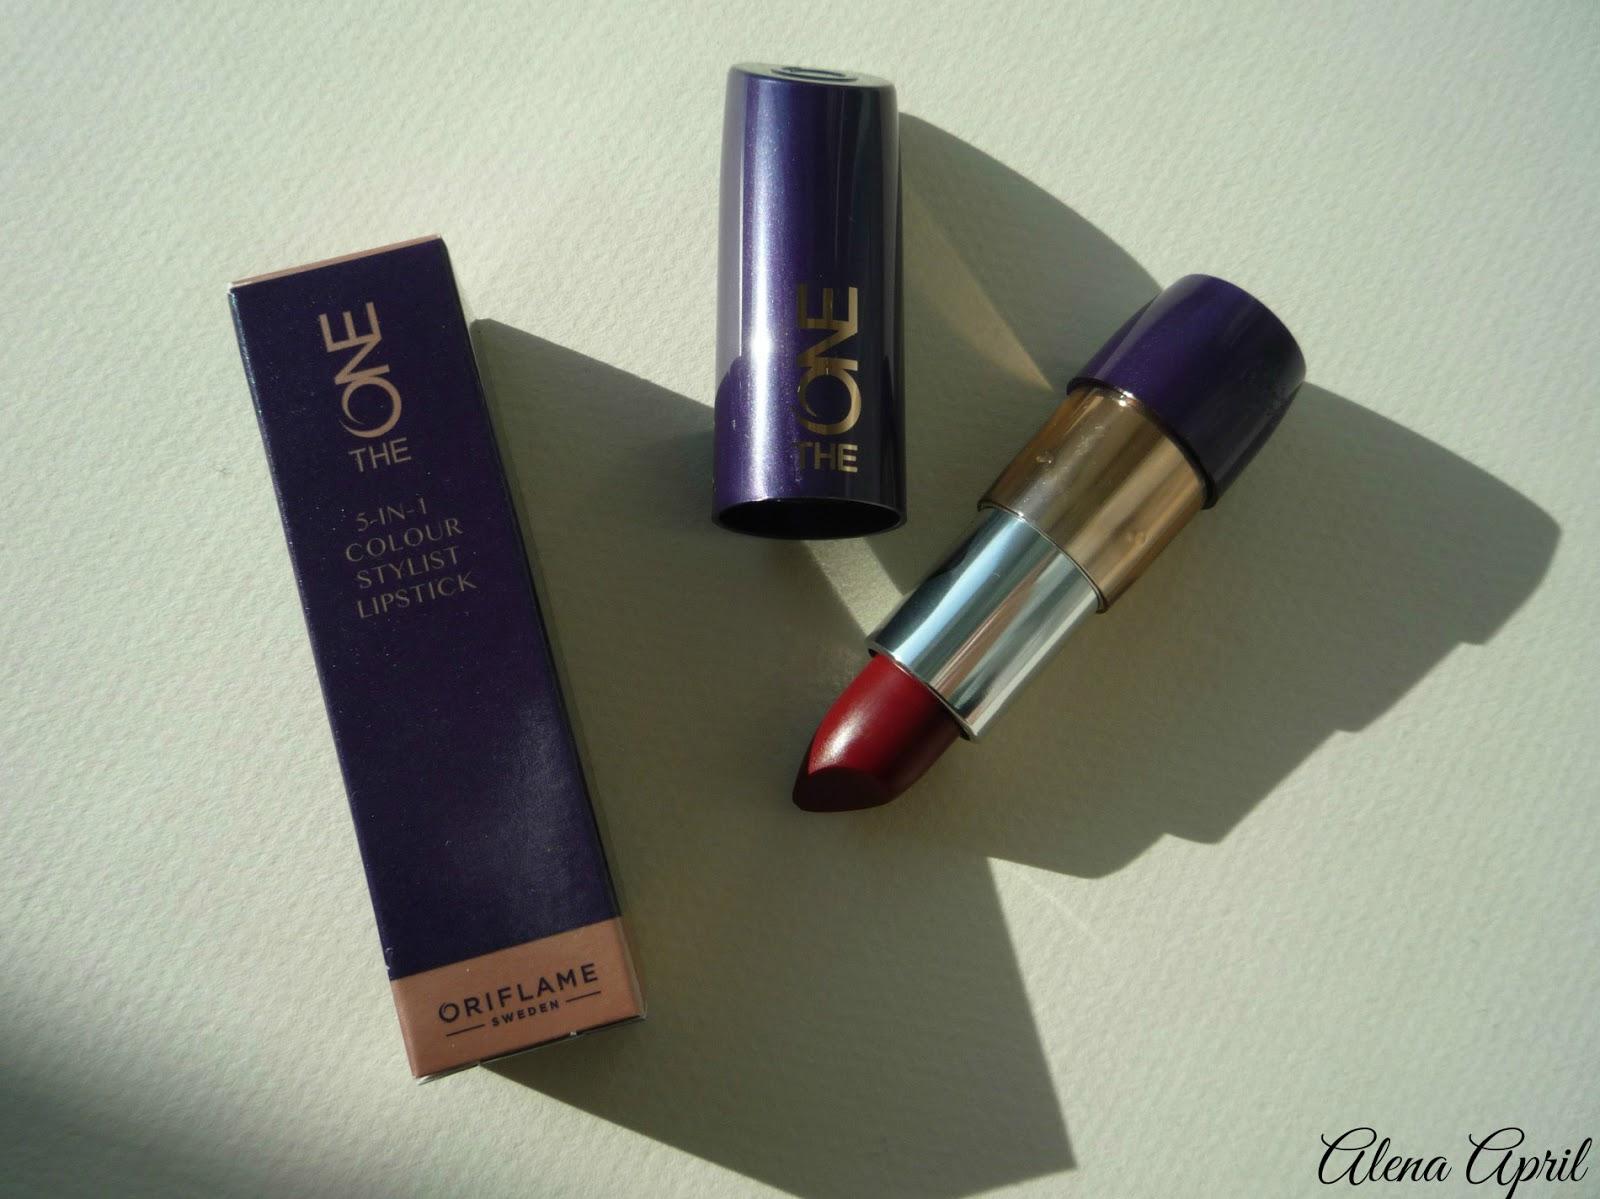 The One 5-in-1 colour stylist lipstick от Oriflame, дымчатый красный, 30674, свотчи, отзыв, помада 5-в-1